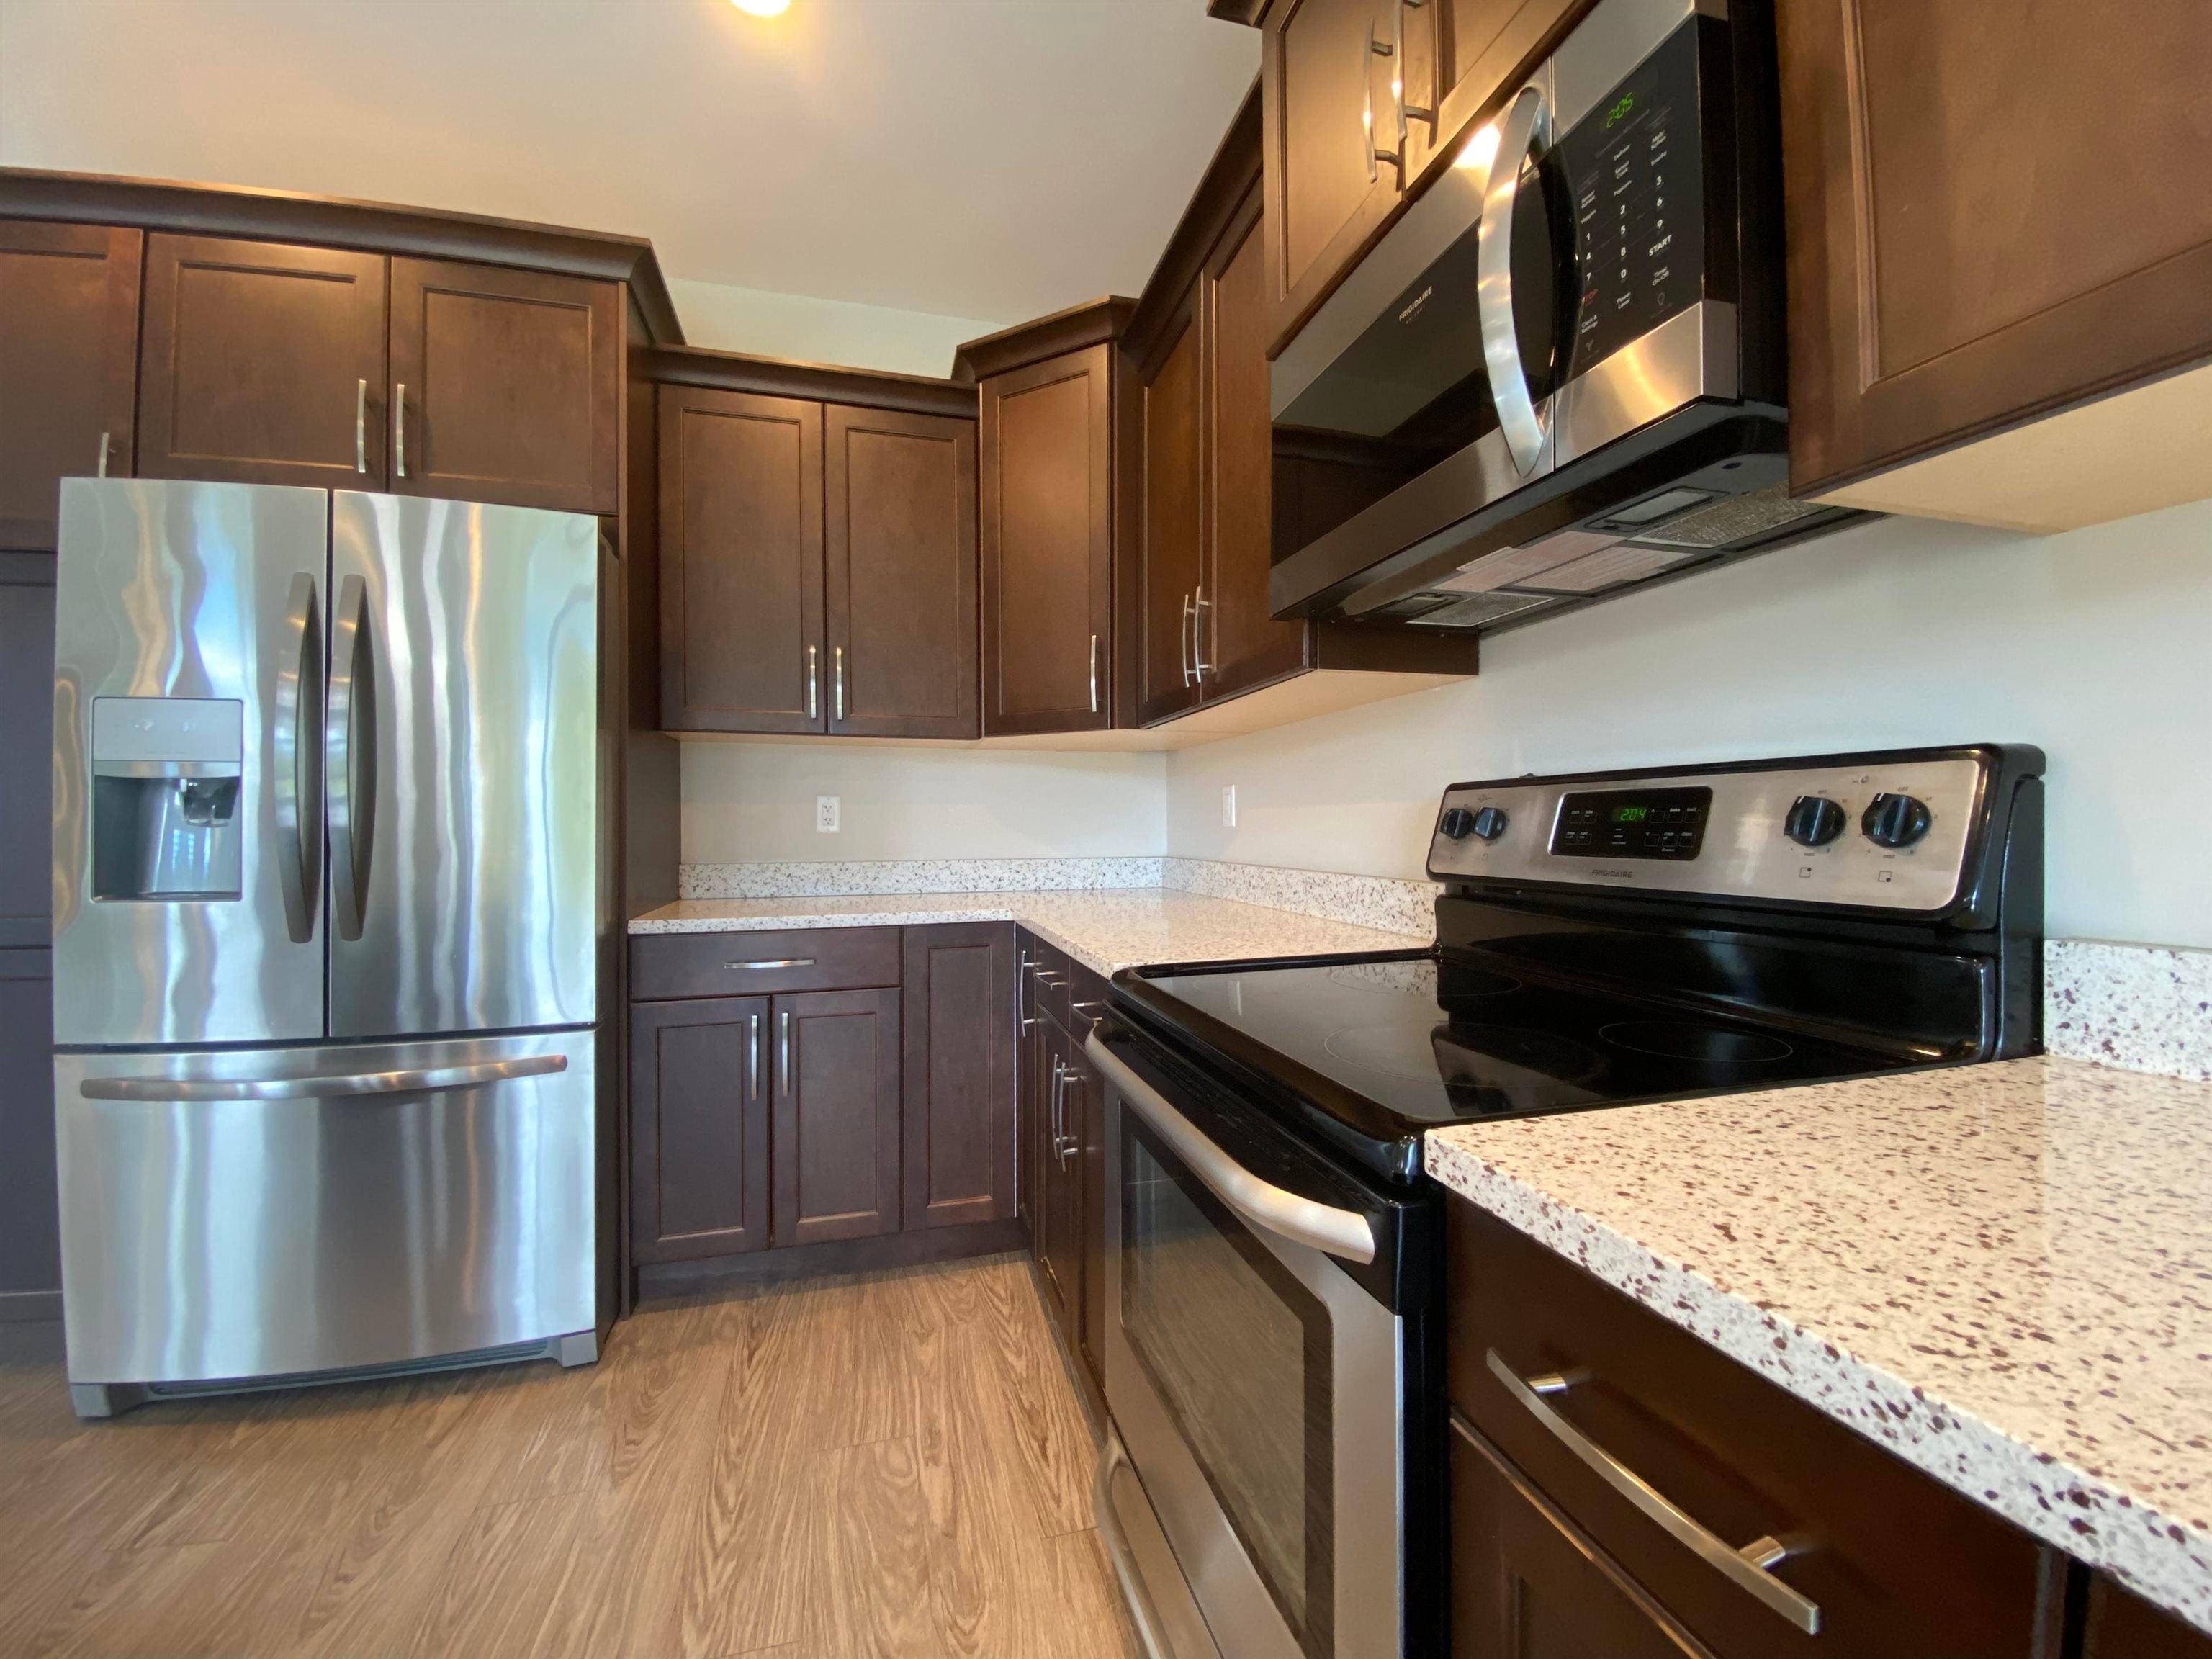 10144 KILLARNEY DRIVE - Fairfield Island House/Single Family for sale, 5 Bedrooms (R2625716) - #17